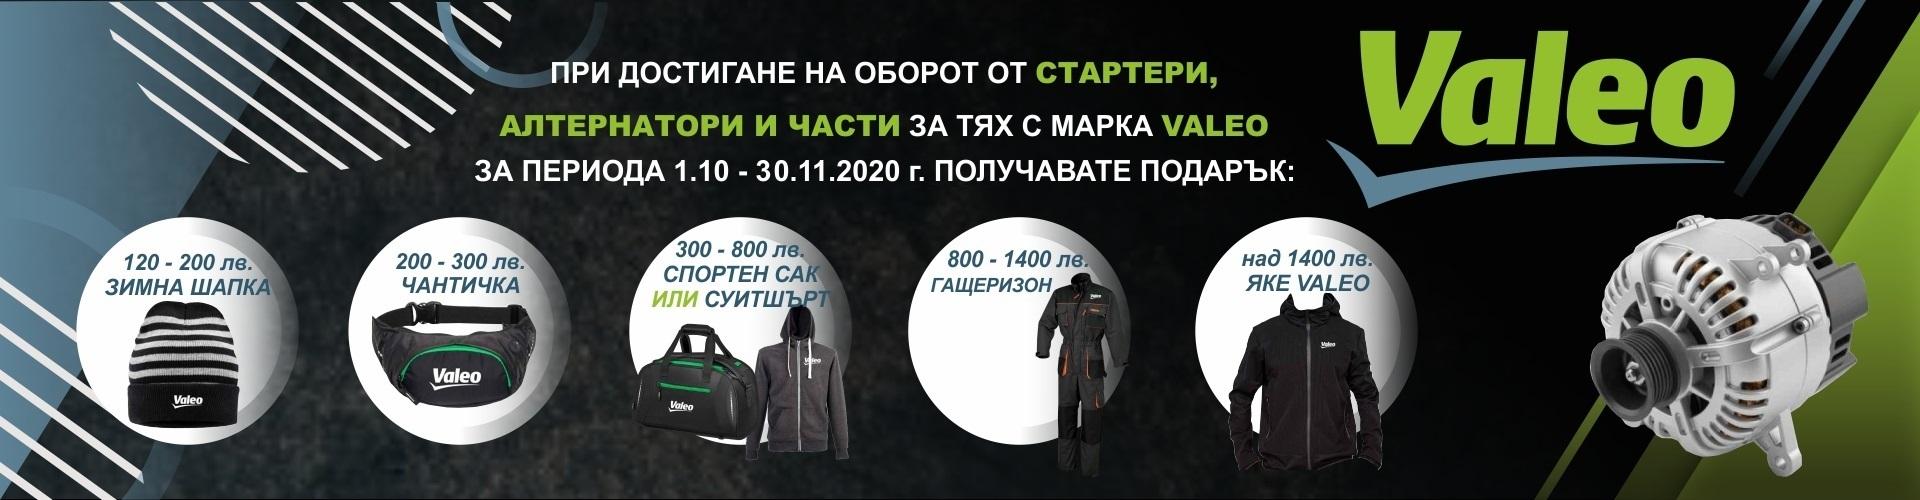 promo_valeo_saediniteli_16.10.2019-30.11.2019_banner.jpg